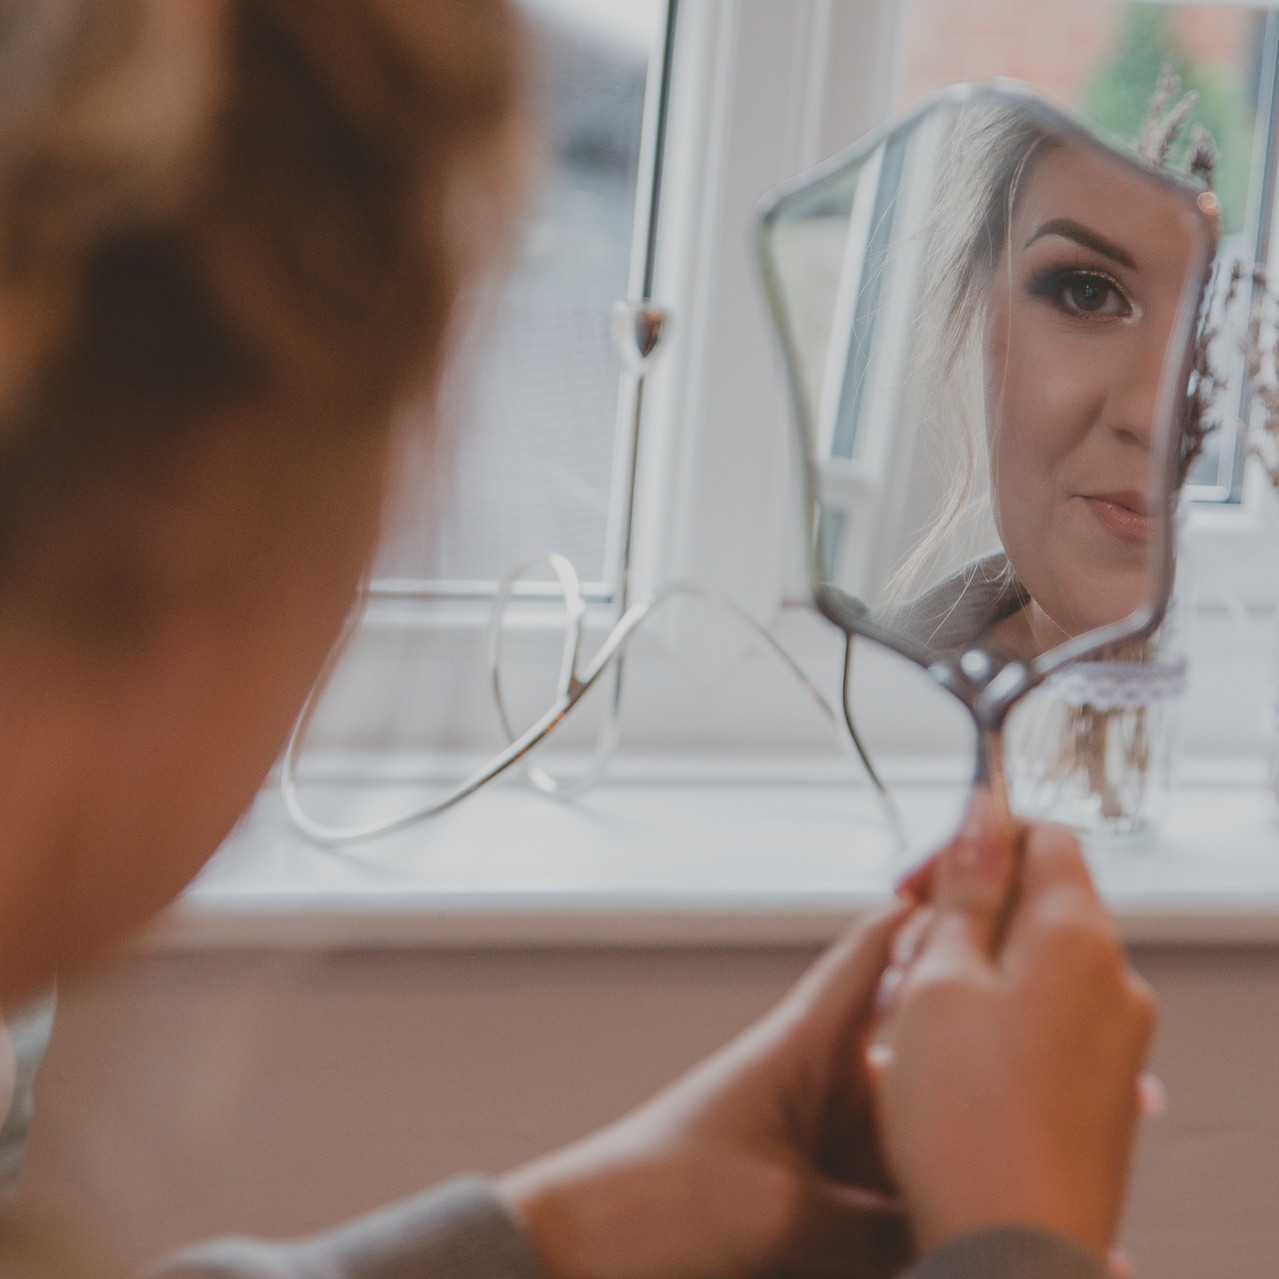 Fay Wedding - Thursford Collection at the Garden Pavilion, Norfolk. Mirror reflection